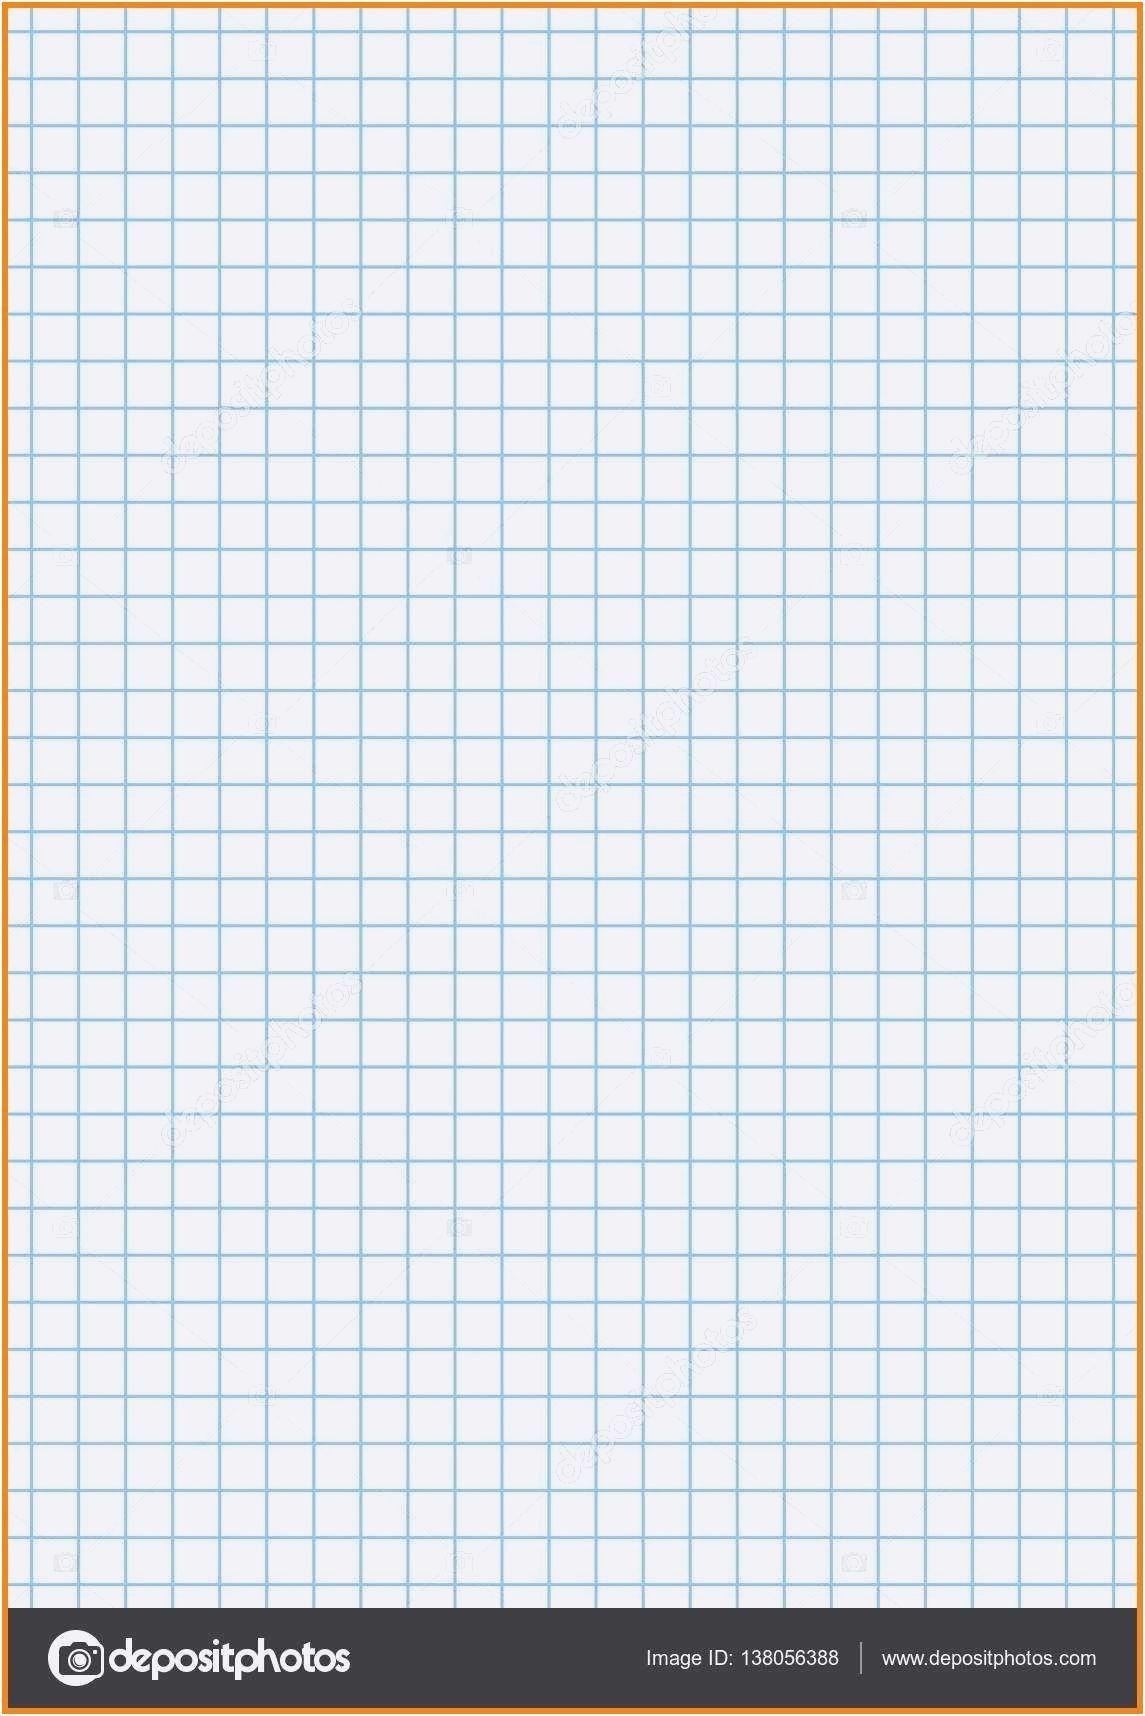 Vorlage Fur Liniertes Papier Stock Illustration Adobe Stock